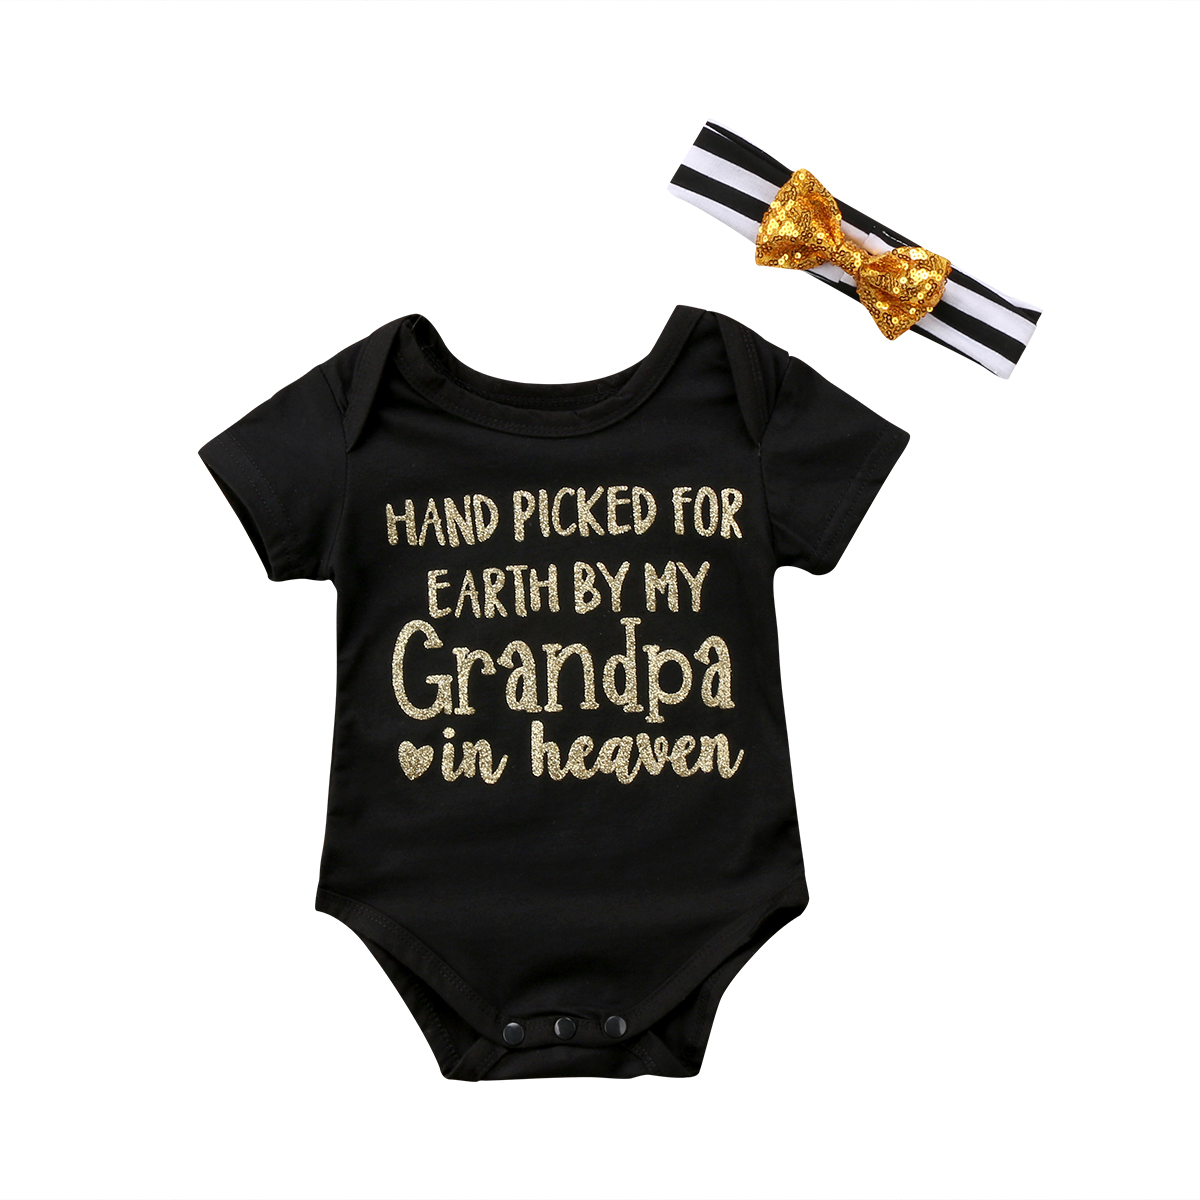 Cute Newborn Baby Girls Short Sleeve Romper Grandpa Grandma Letter Printing Playsuit Sunsuit+Striped Headband Outfit Clothes